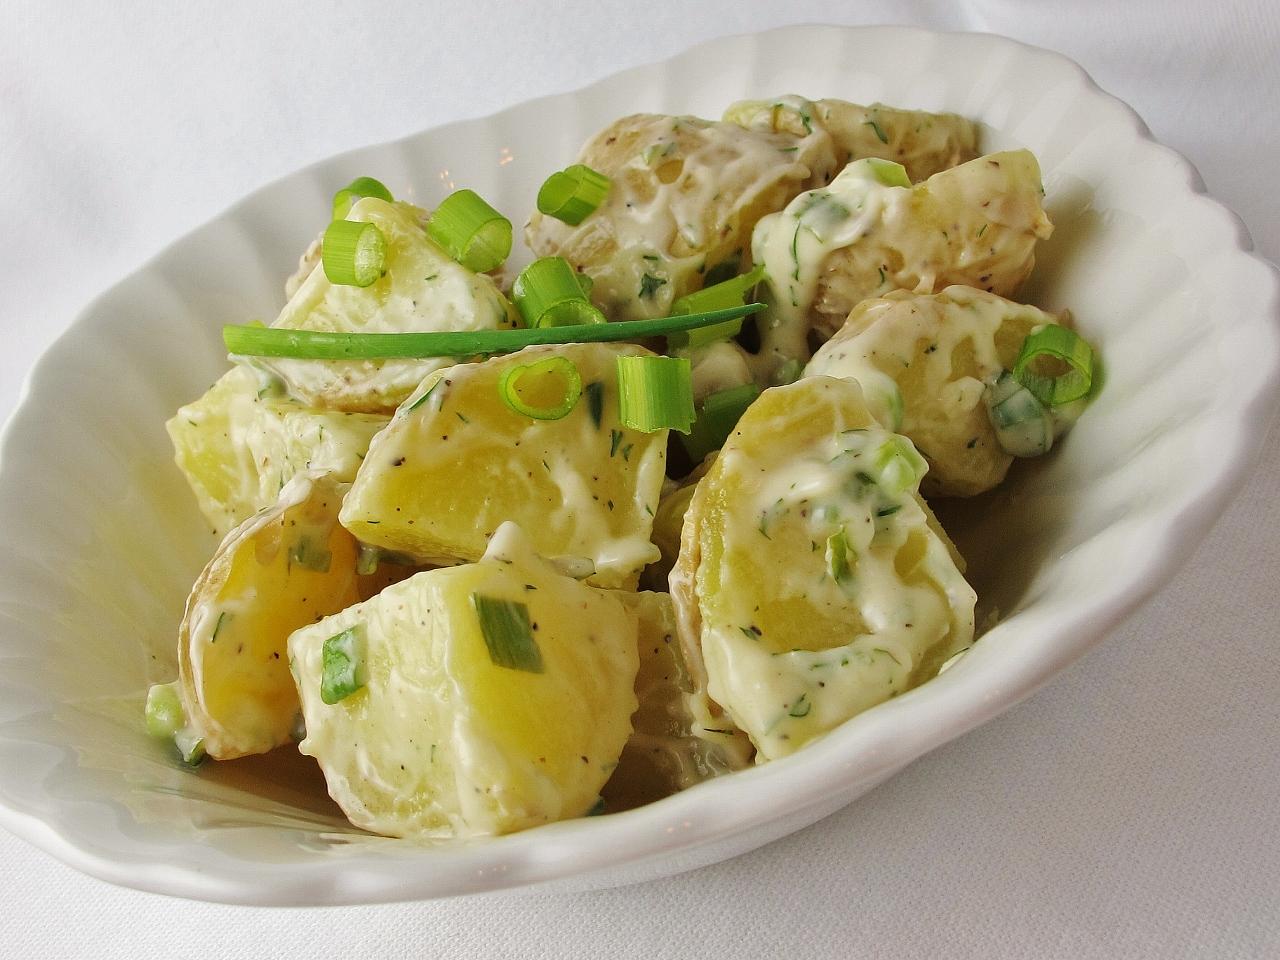 Tangy Dill Potato Salad